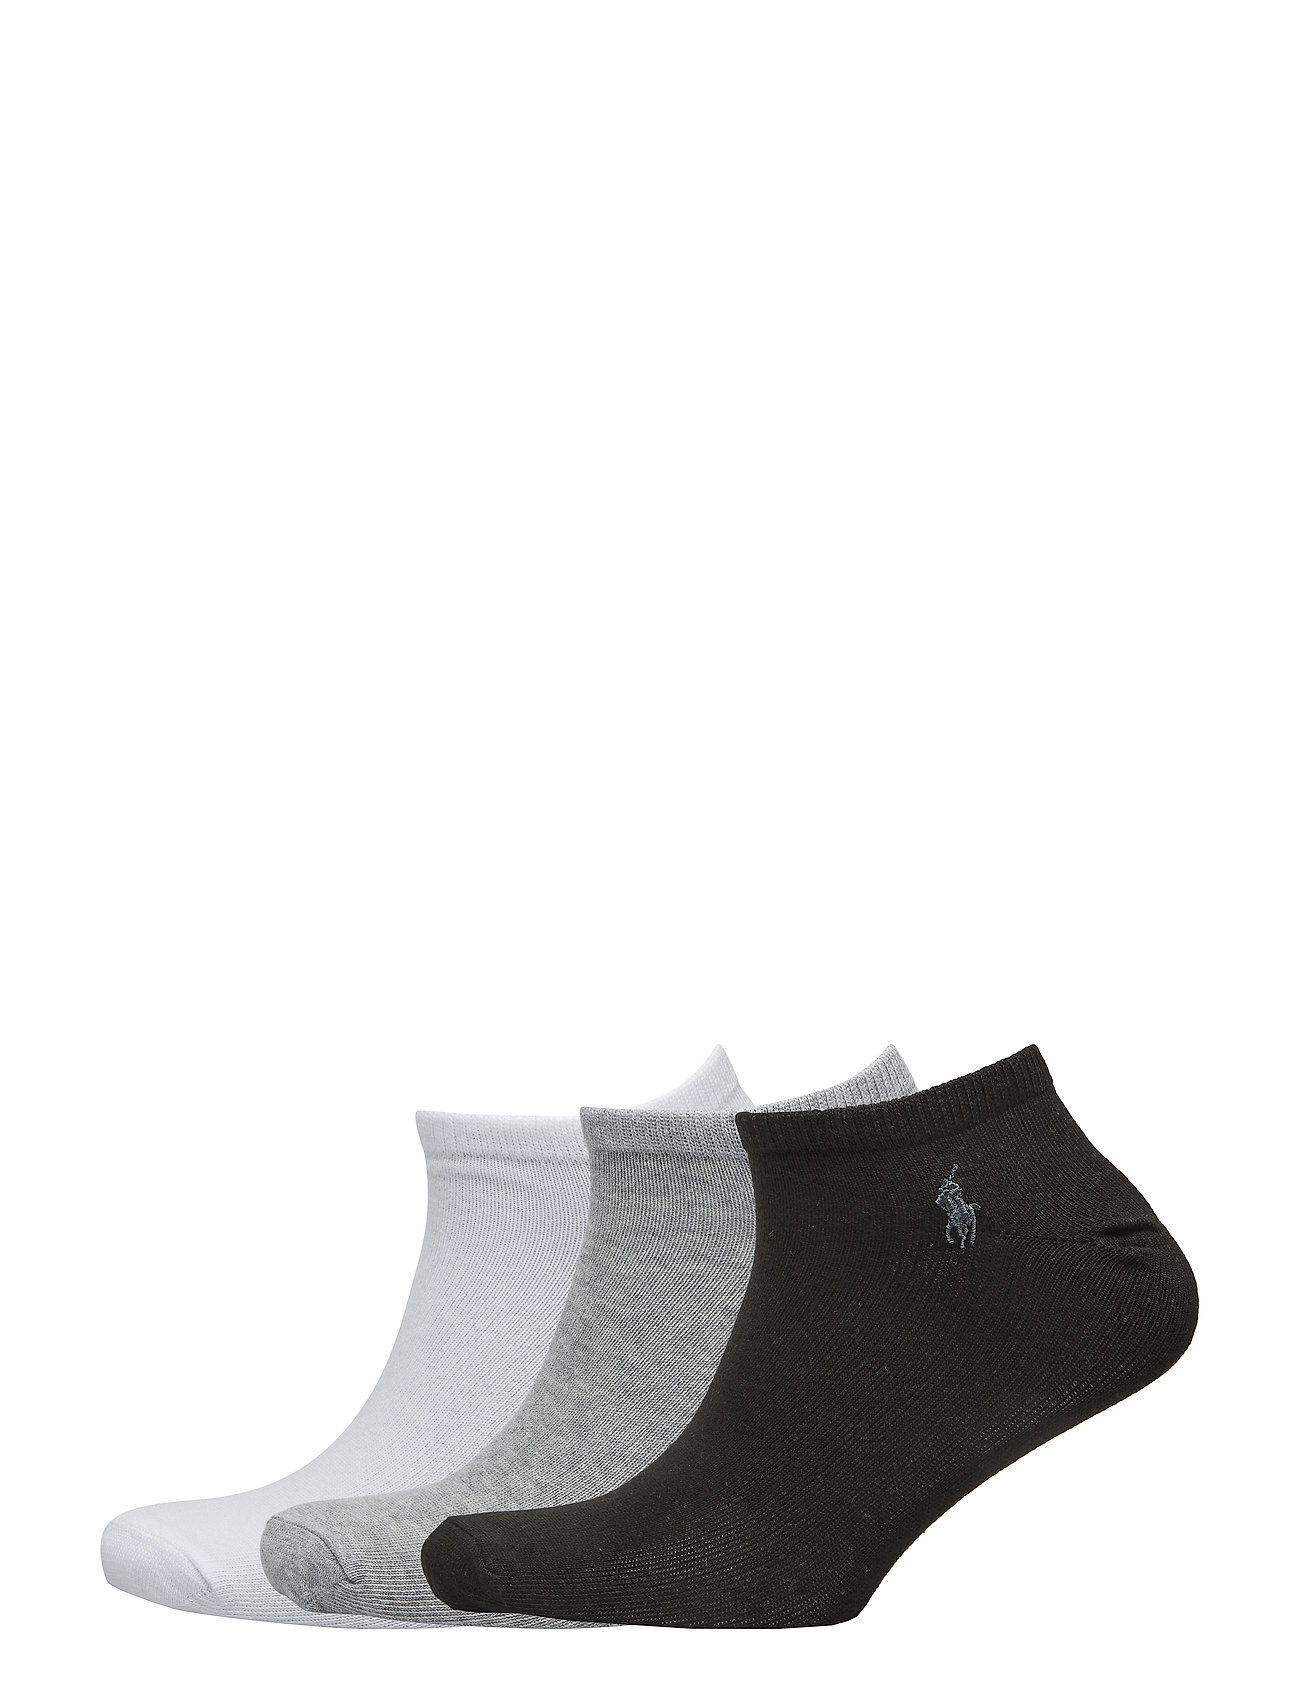 Polo Ralph Lauren GHOST PED PP-SOCKS-3 PACK - BLACK ASSORTED